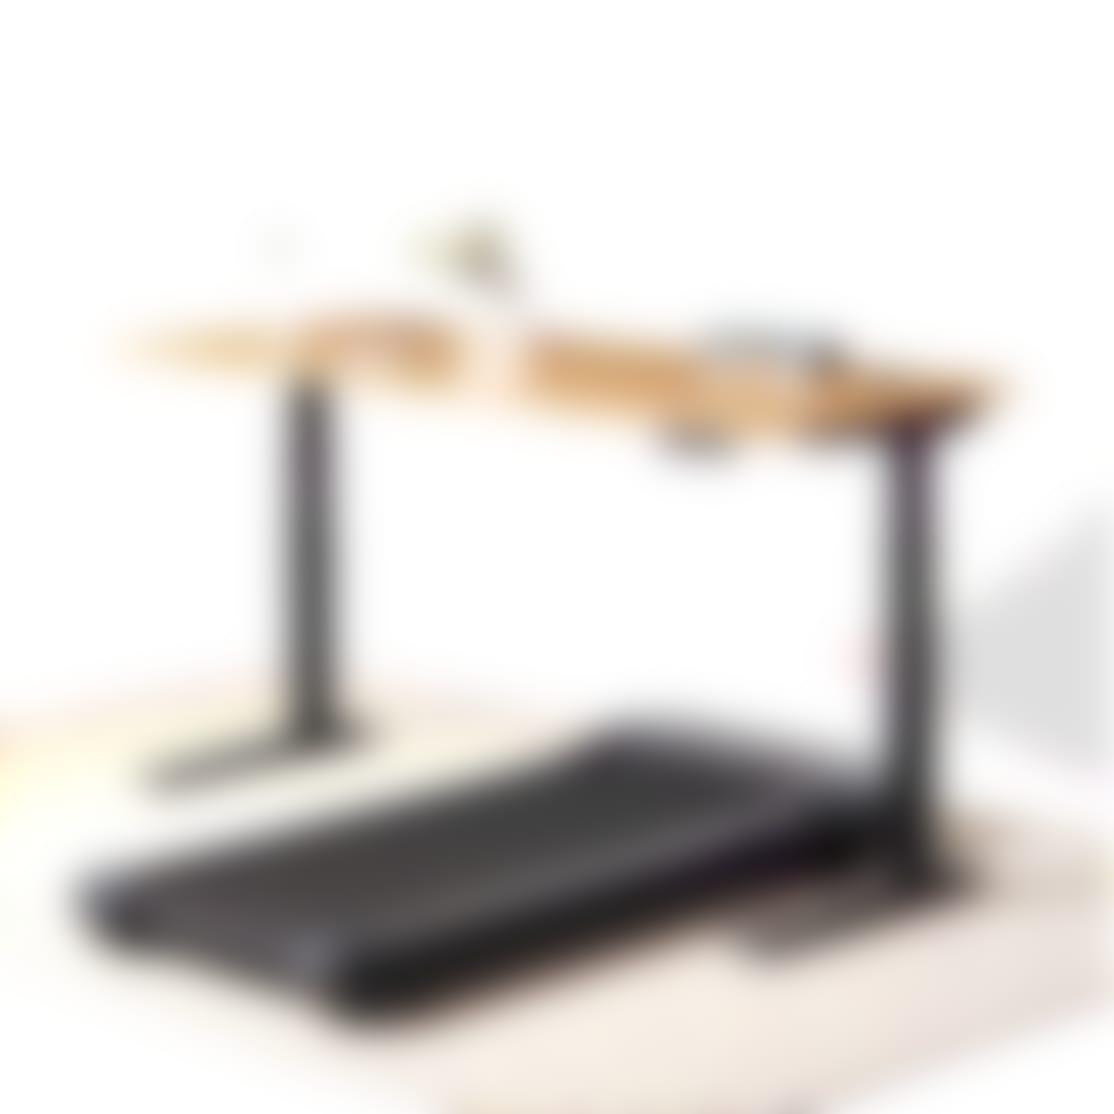 Jarvis Bamboo Treadmill desk